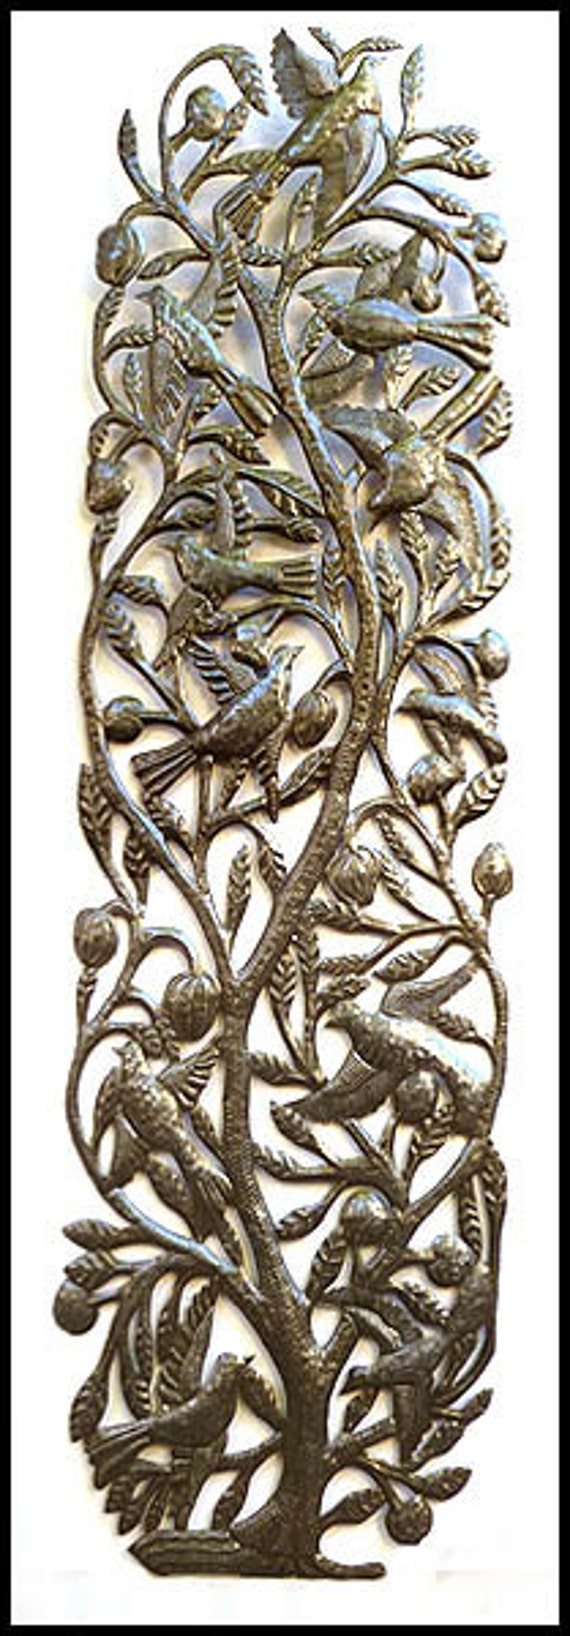 Metal Wall Art - Metal Wall Decor, Metal Art, Haitian Wall Art - Haitian Steel Drum Art, Tree Wall Art, Metal Birds, Tree Decor, 1680-48